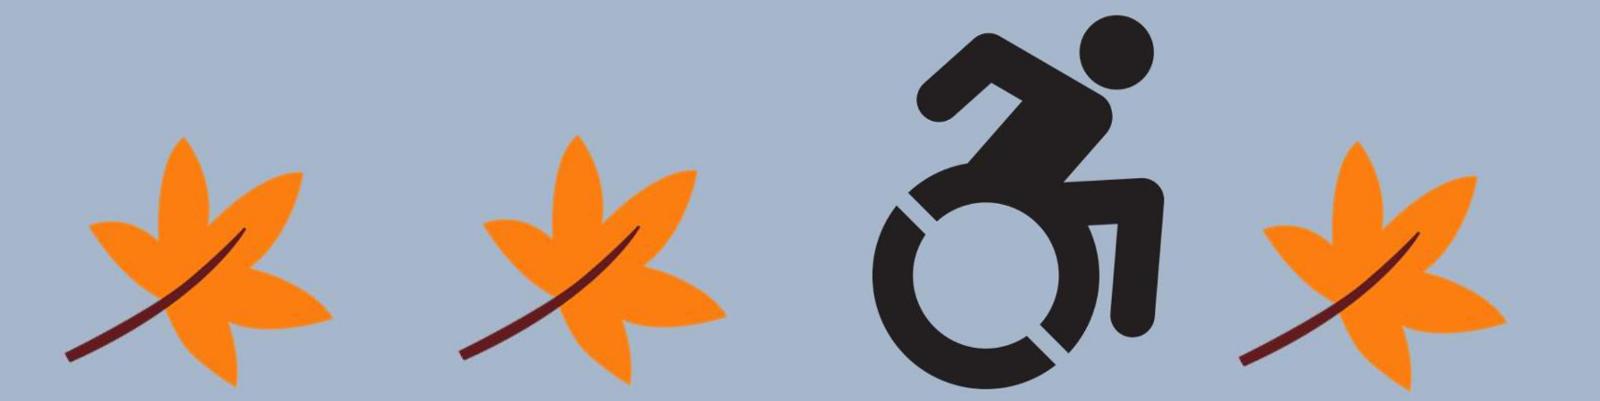 slide:Disability Awareness Month